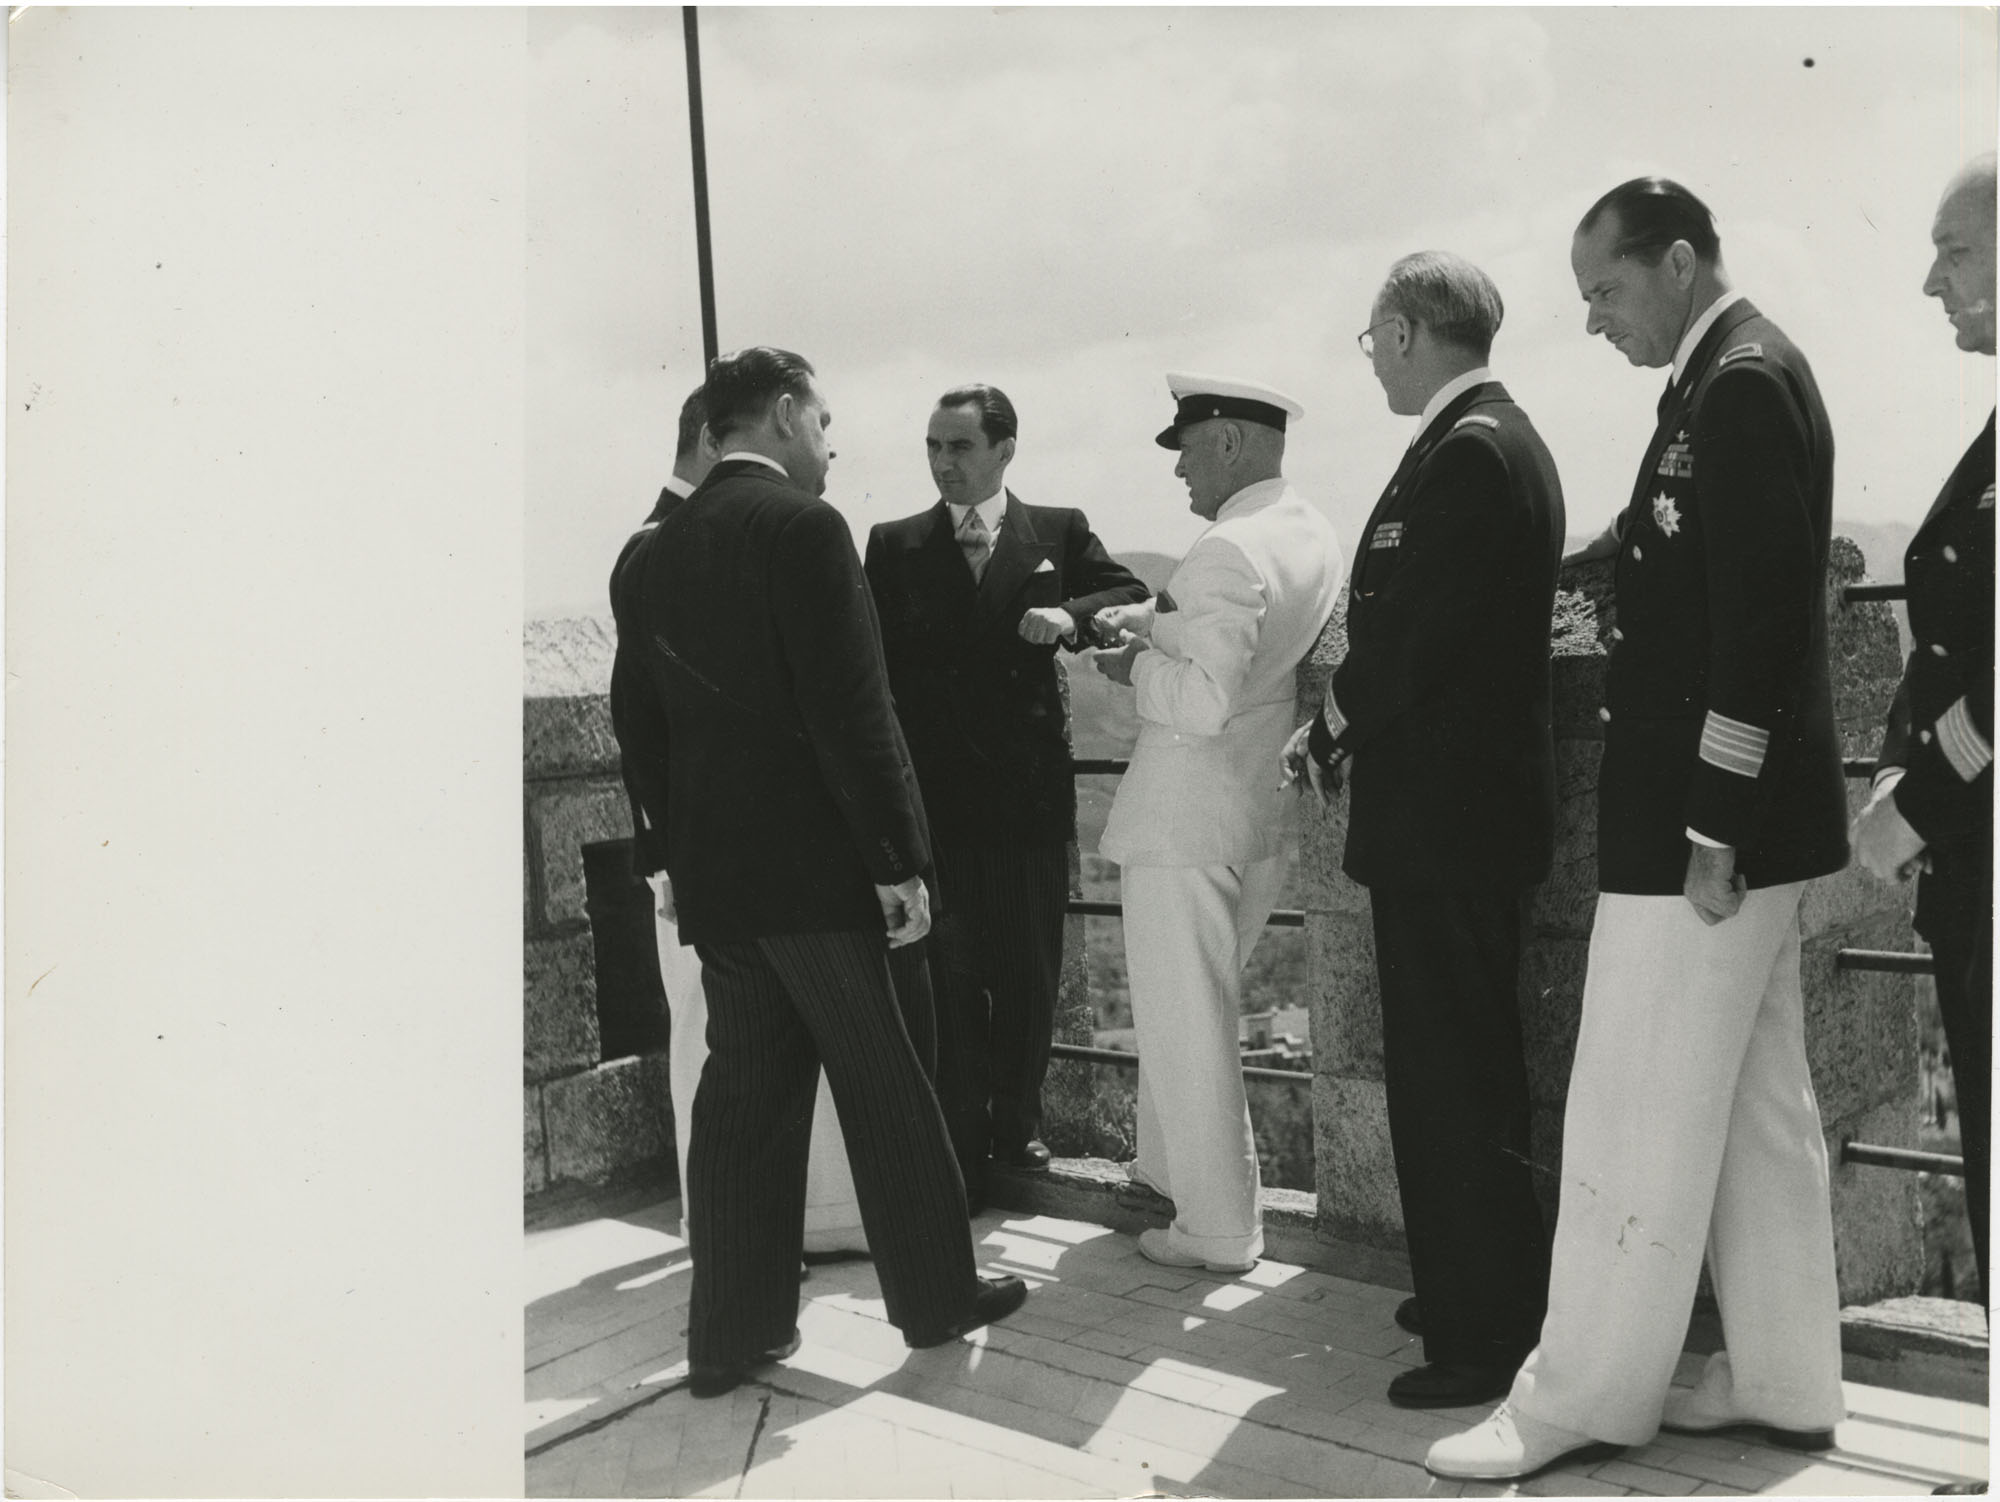 Mihai Antonescu's visit to Benito Mussolini, Photograph 52